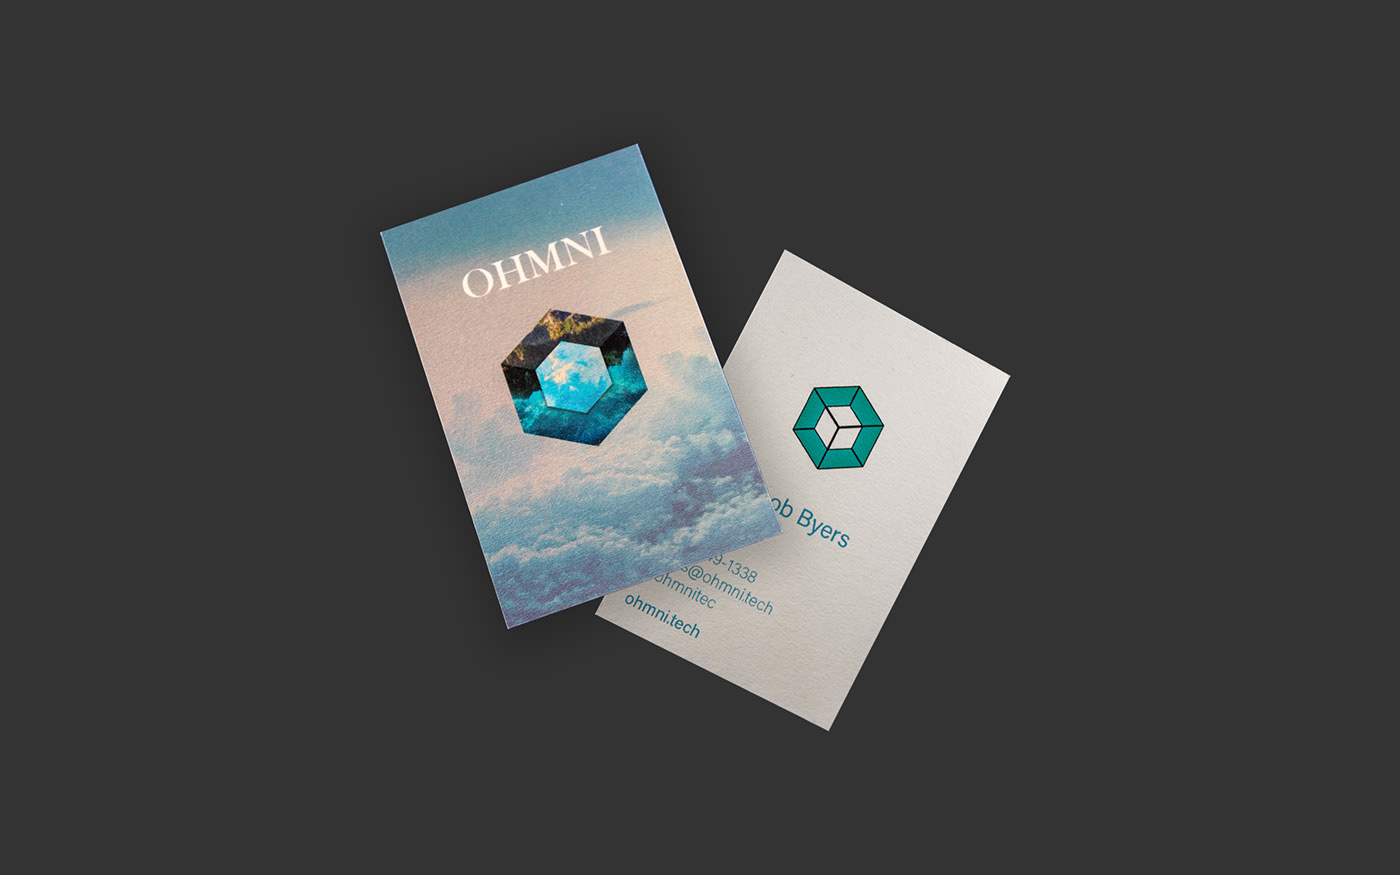 app development All Things OMNI ohmni web creation hexagon